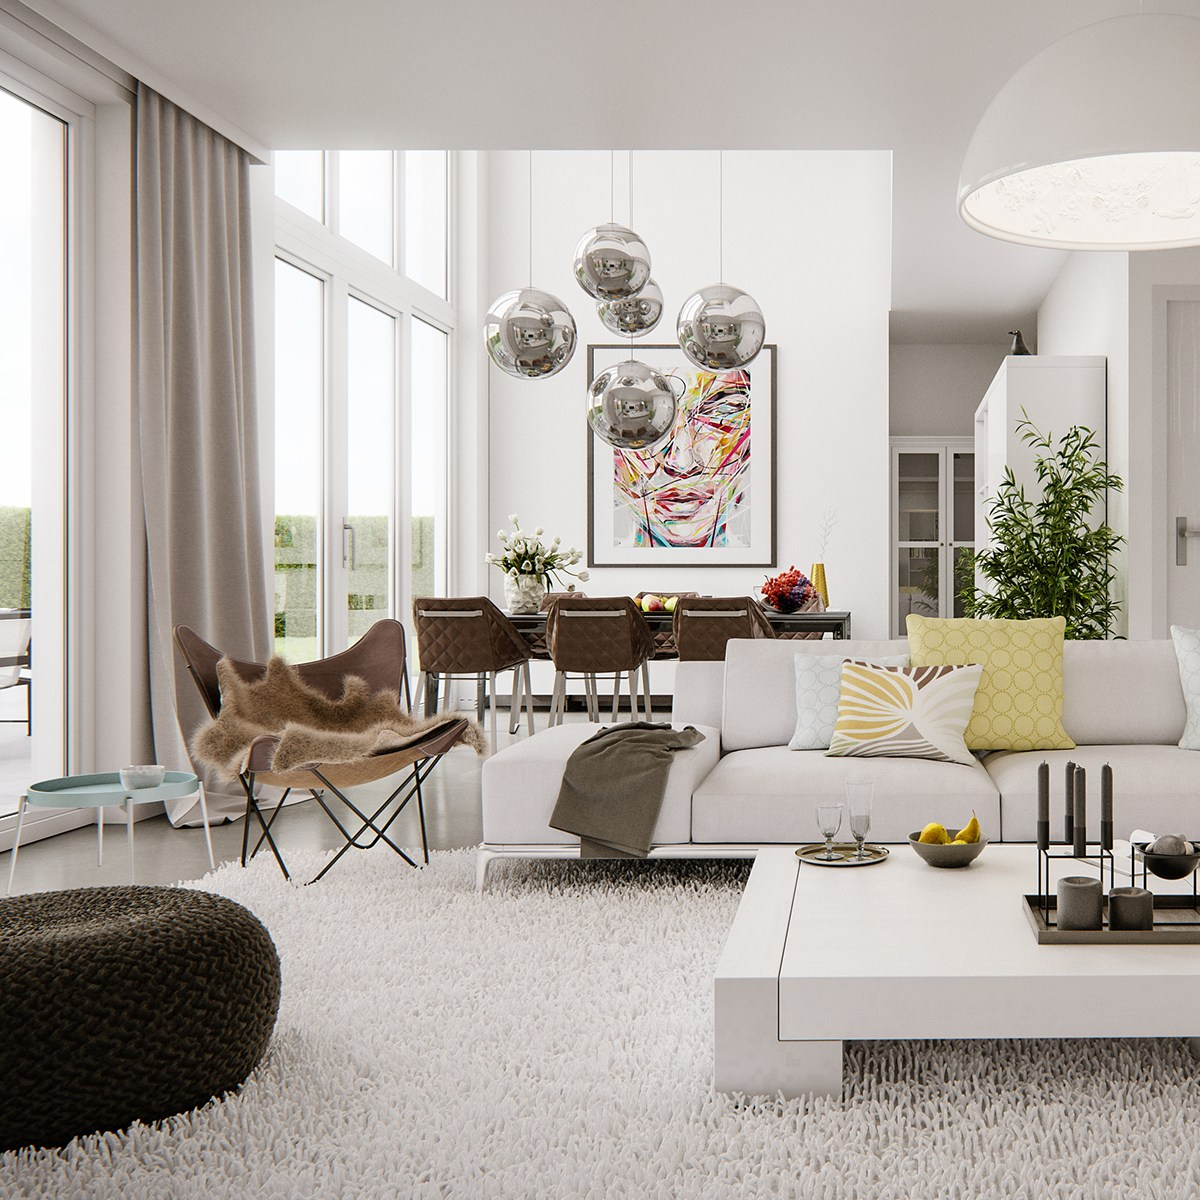 pastel-living-room-color-theme.jpg